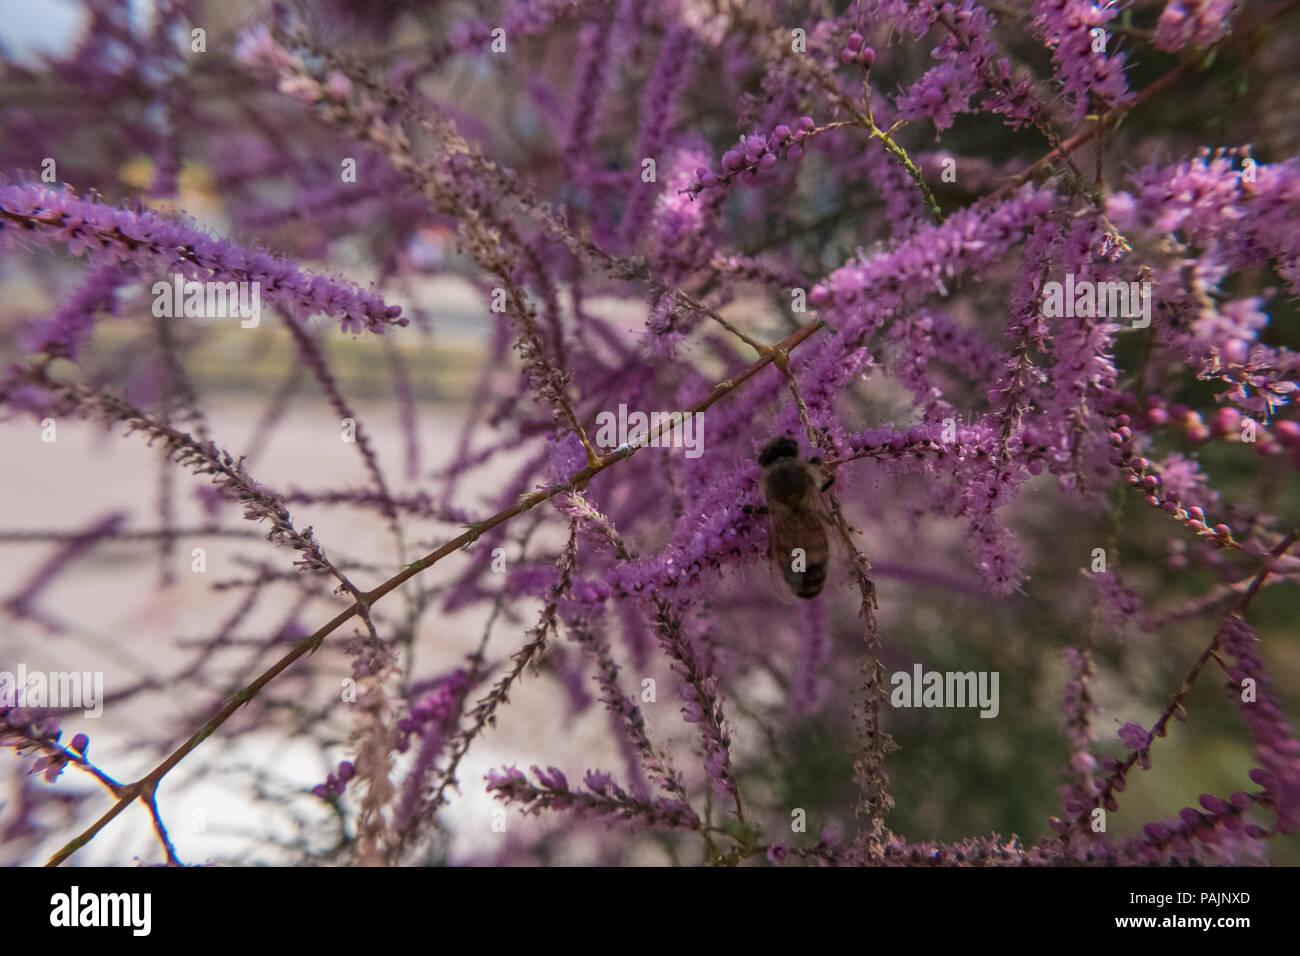 Tamarisk Or Tamarix Pink Flower Plant Beautiful Wild Nature Wallpaper Background No People